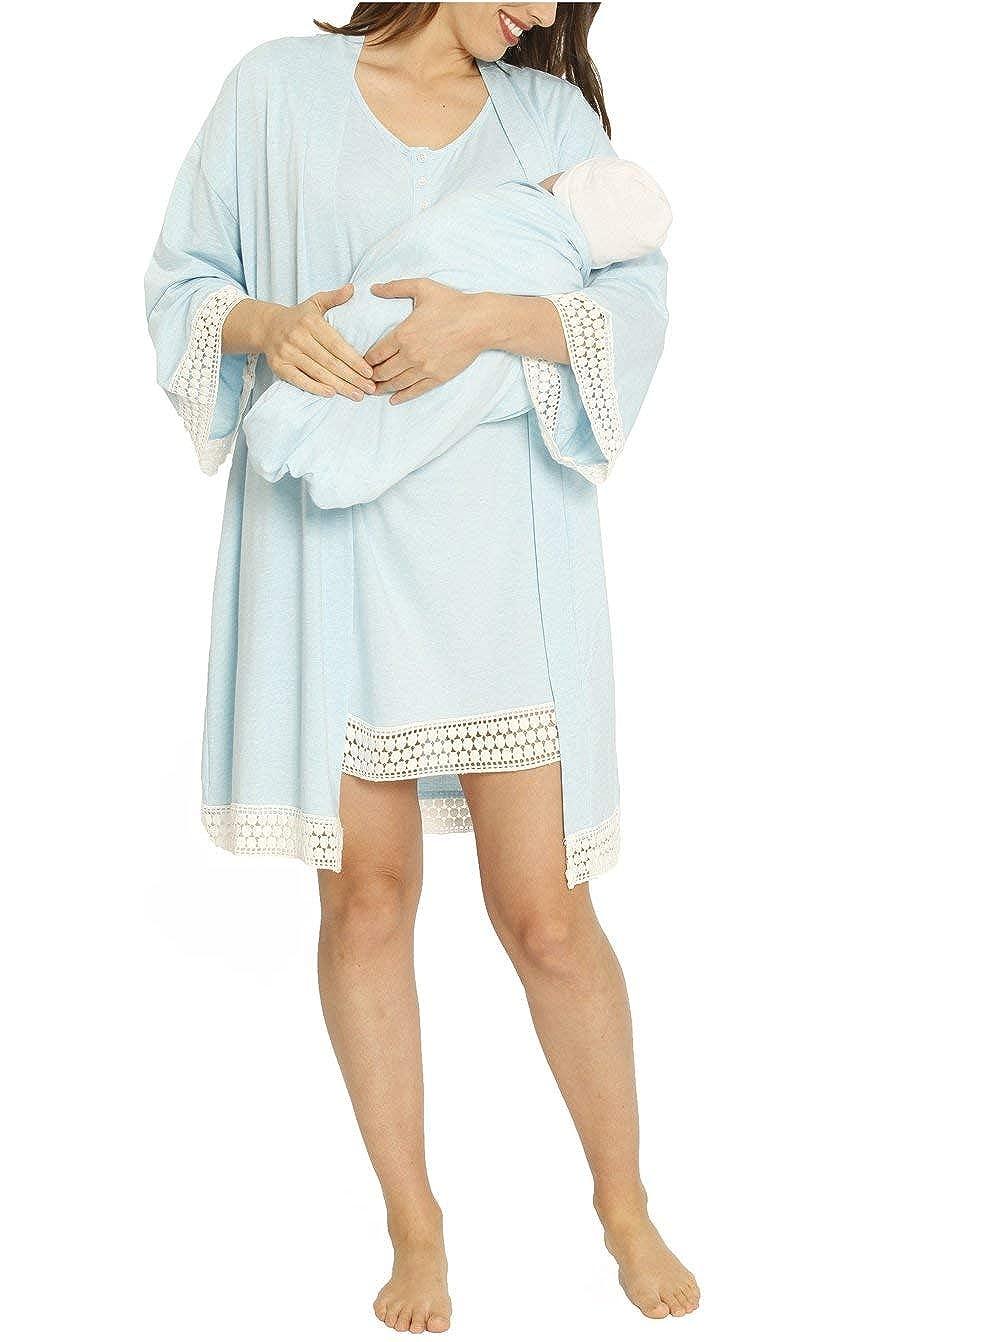 Angel Maternity - Hospital Pack Nursing Dress Hospital Robe + Receiving Baby Blanket Maternity and Nursing kit